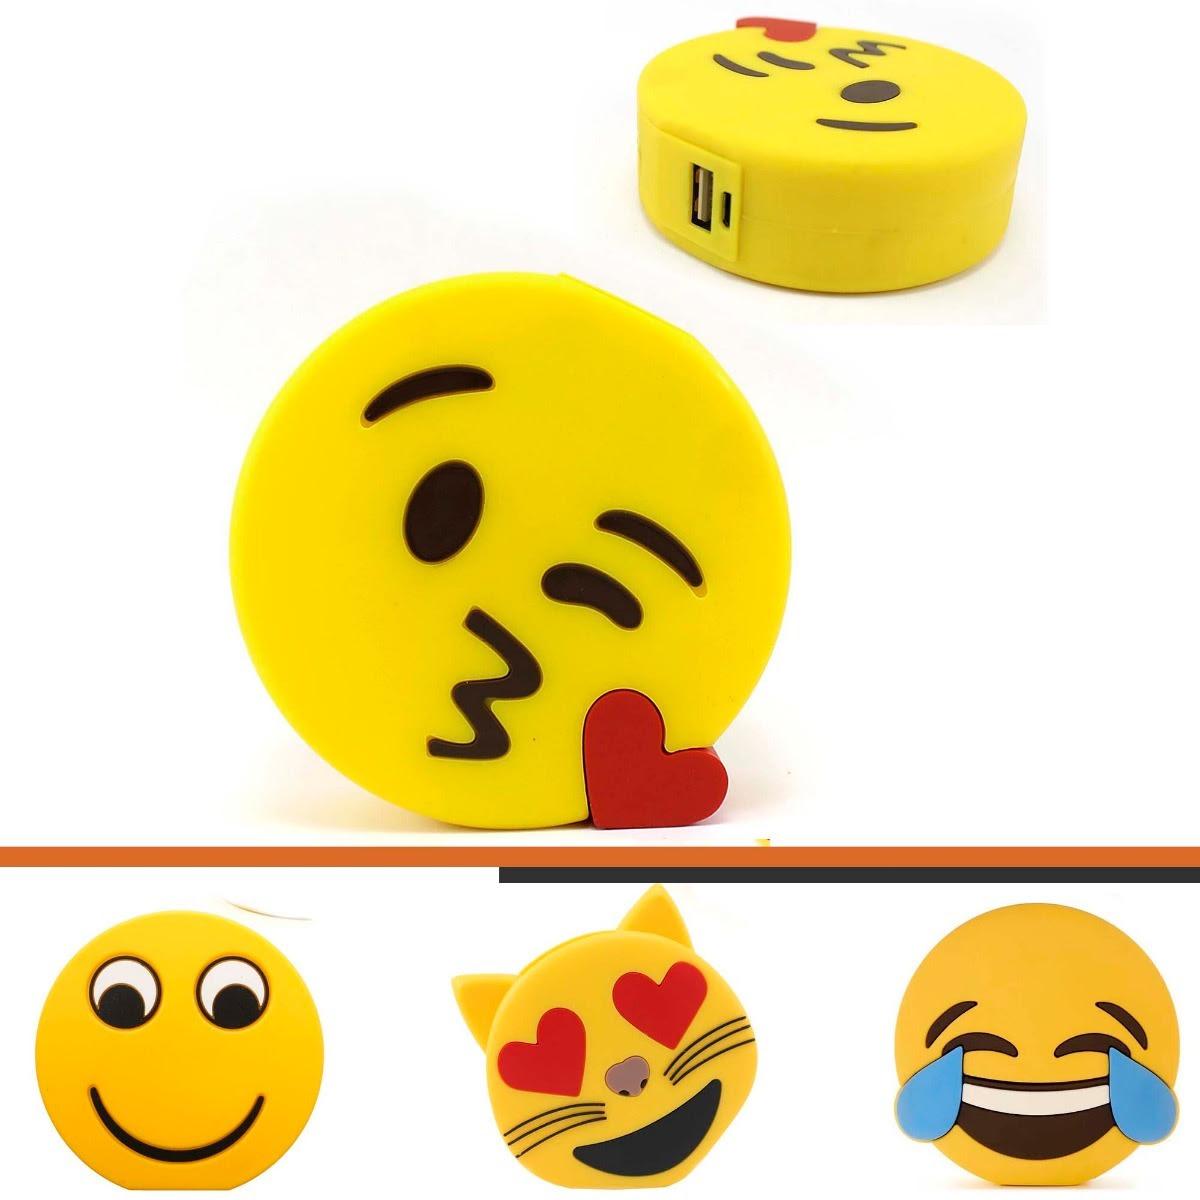 53 Gambar Emoticon Marah Bergerak HD Gambar Pixabay